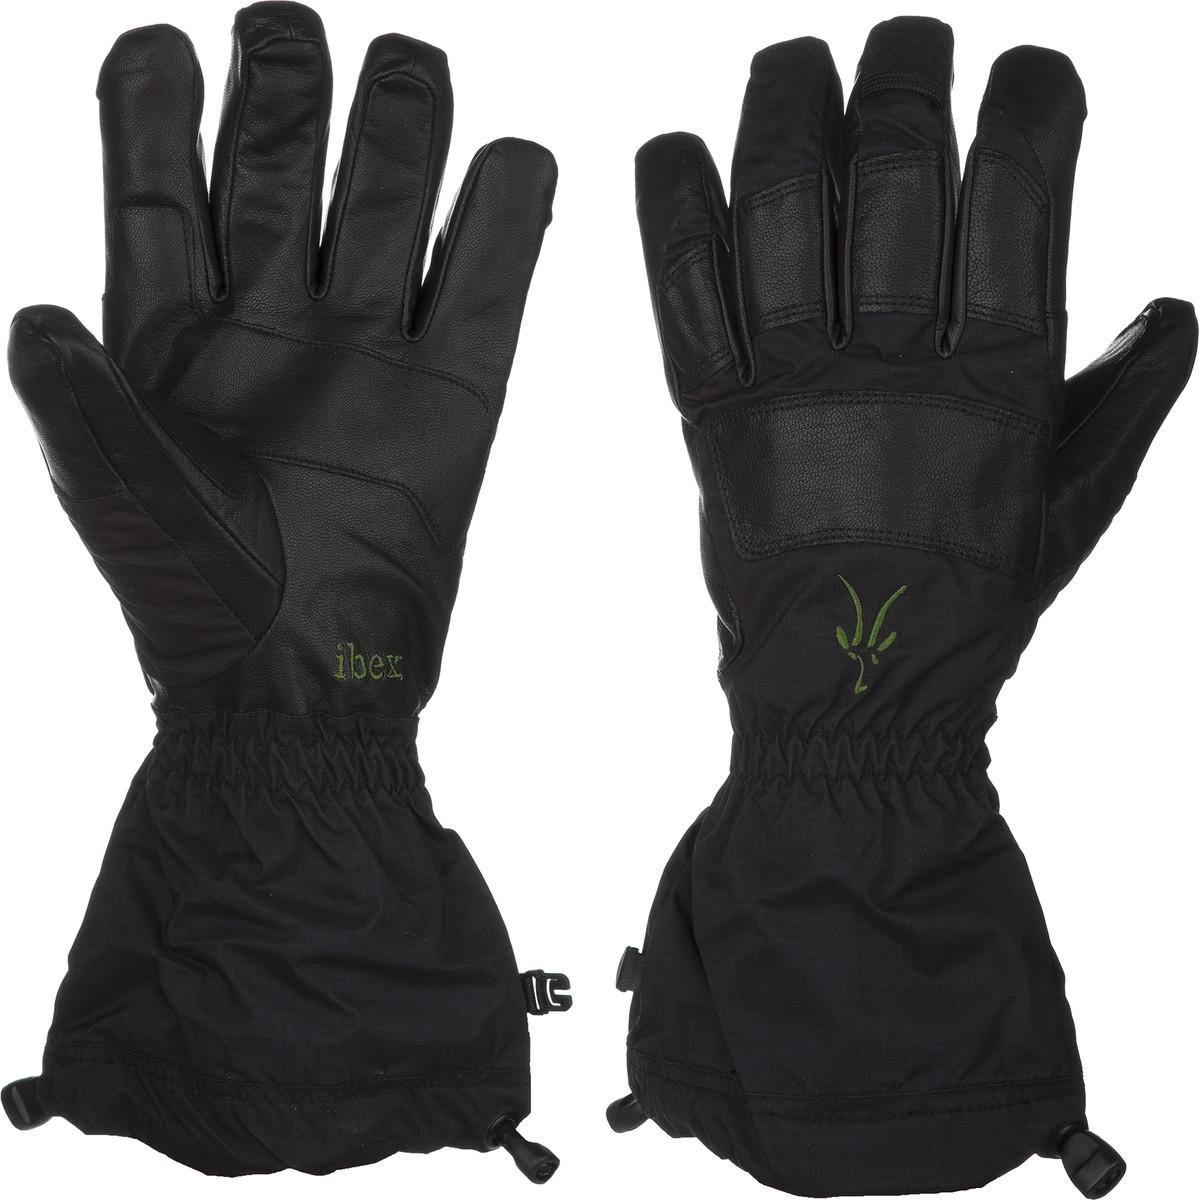 Ibex Freeride Glove